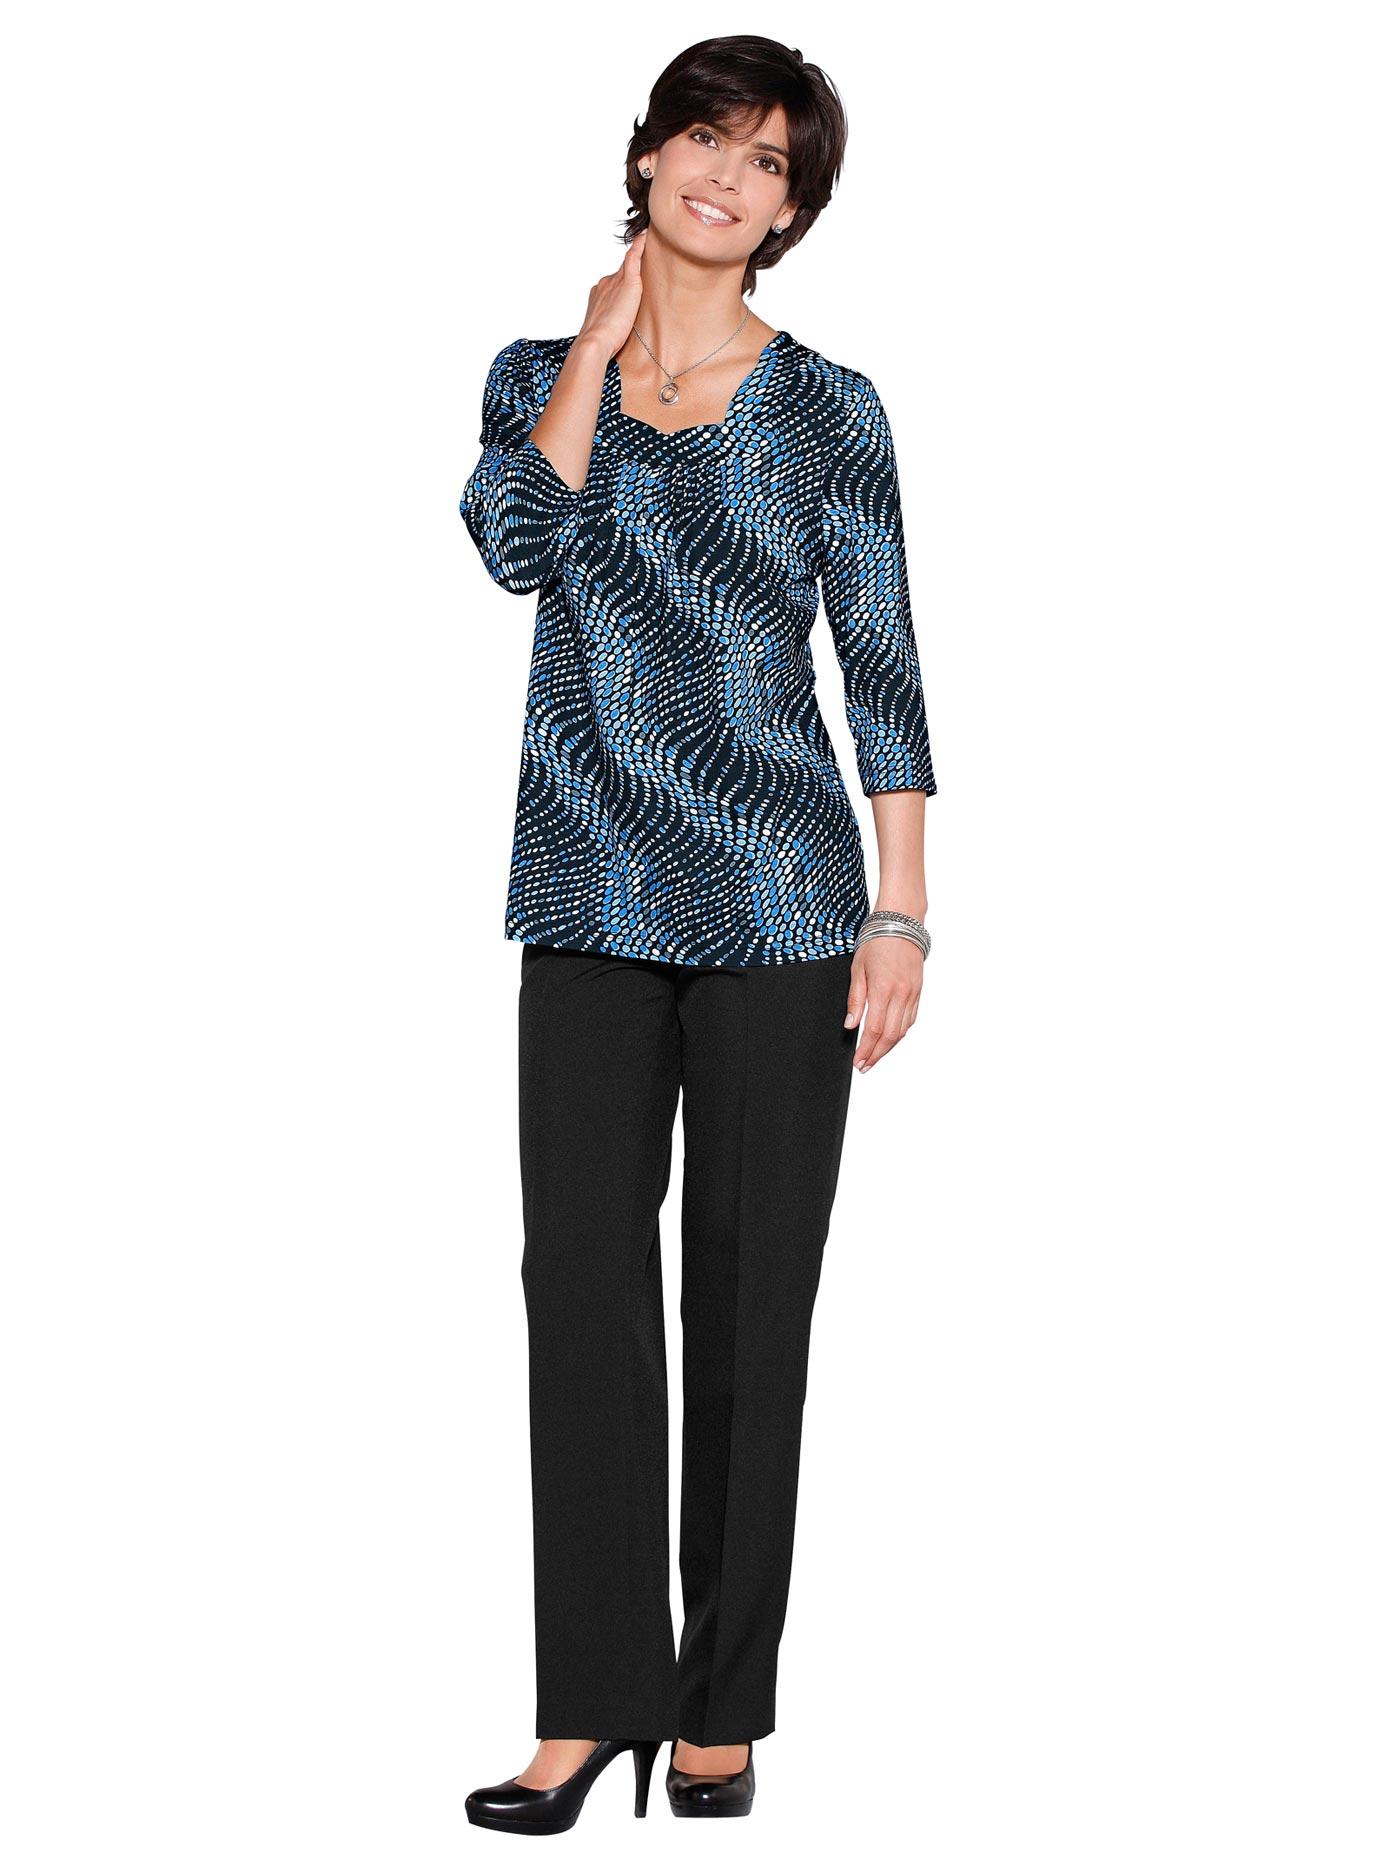 Classic Basics Tunikashirt mit modischer Raffung im Vordertei | Bekleidung > Shirts > Tunikashirts | Classic Basics